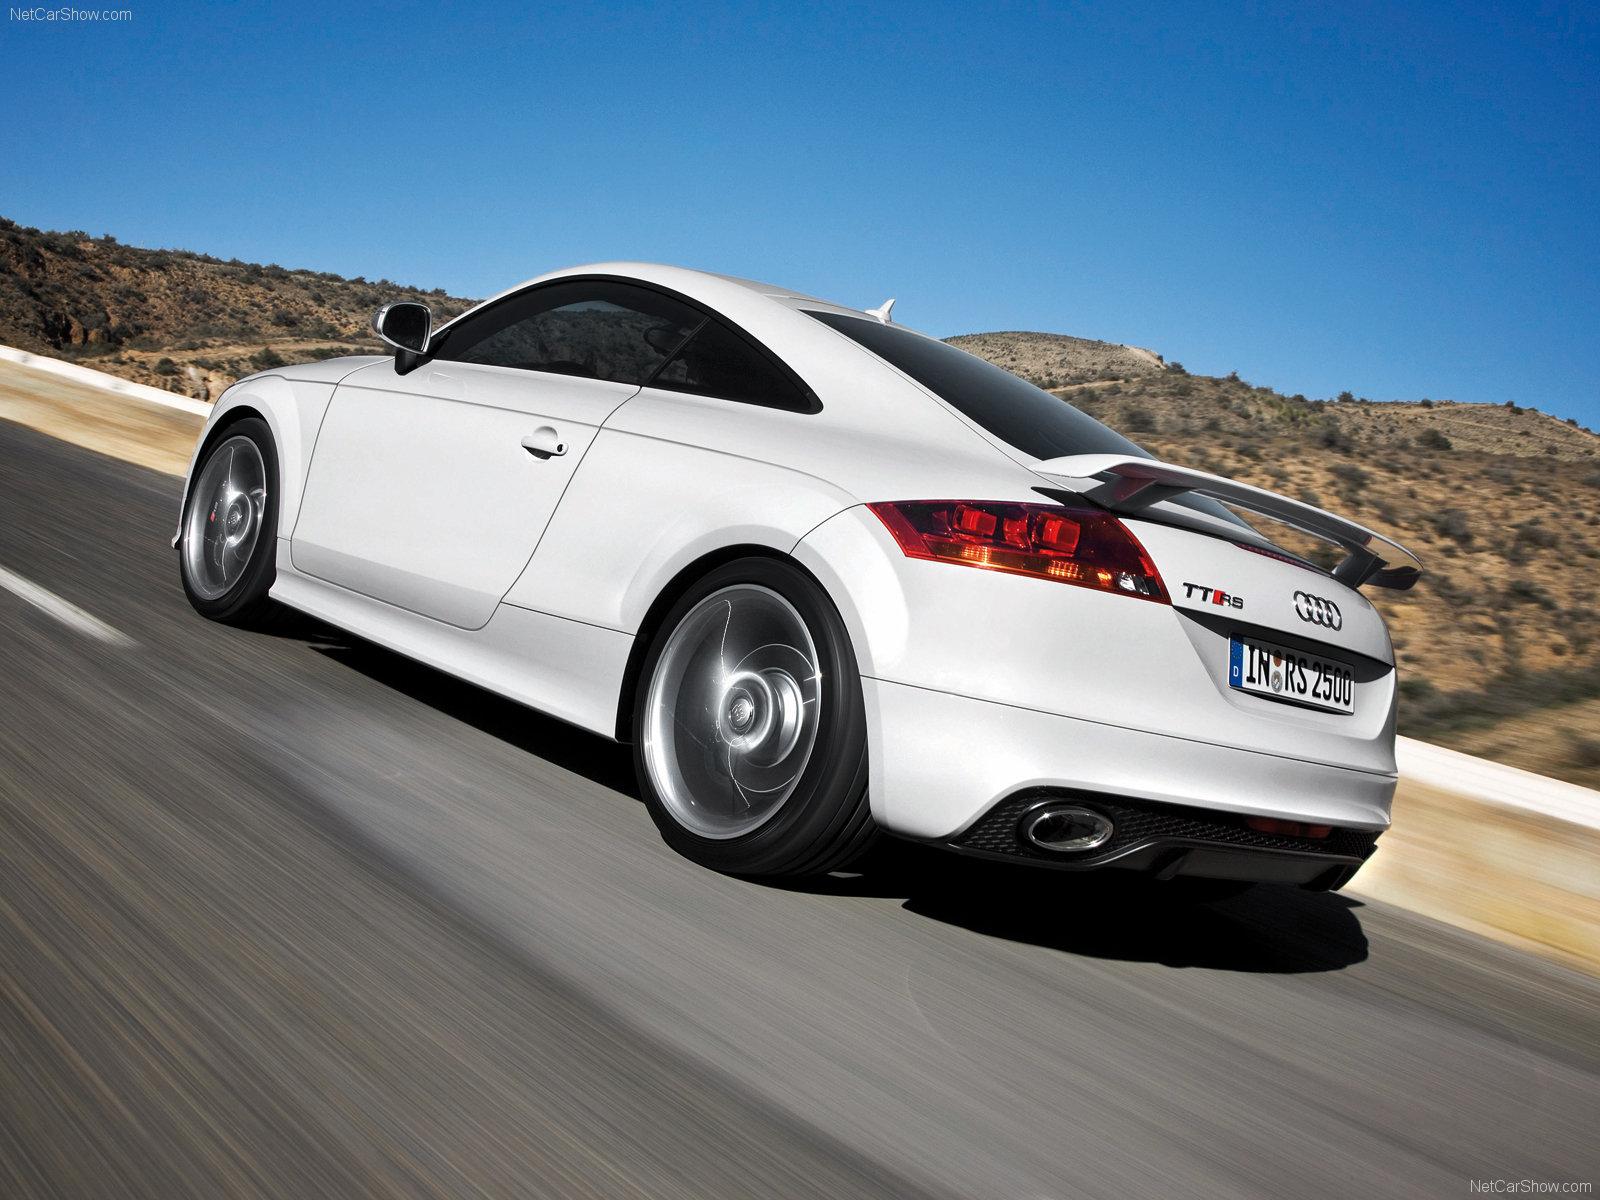 Audi TT RS Wallpapers HD Download 1600x1200